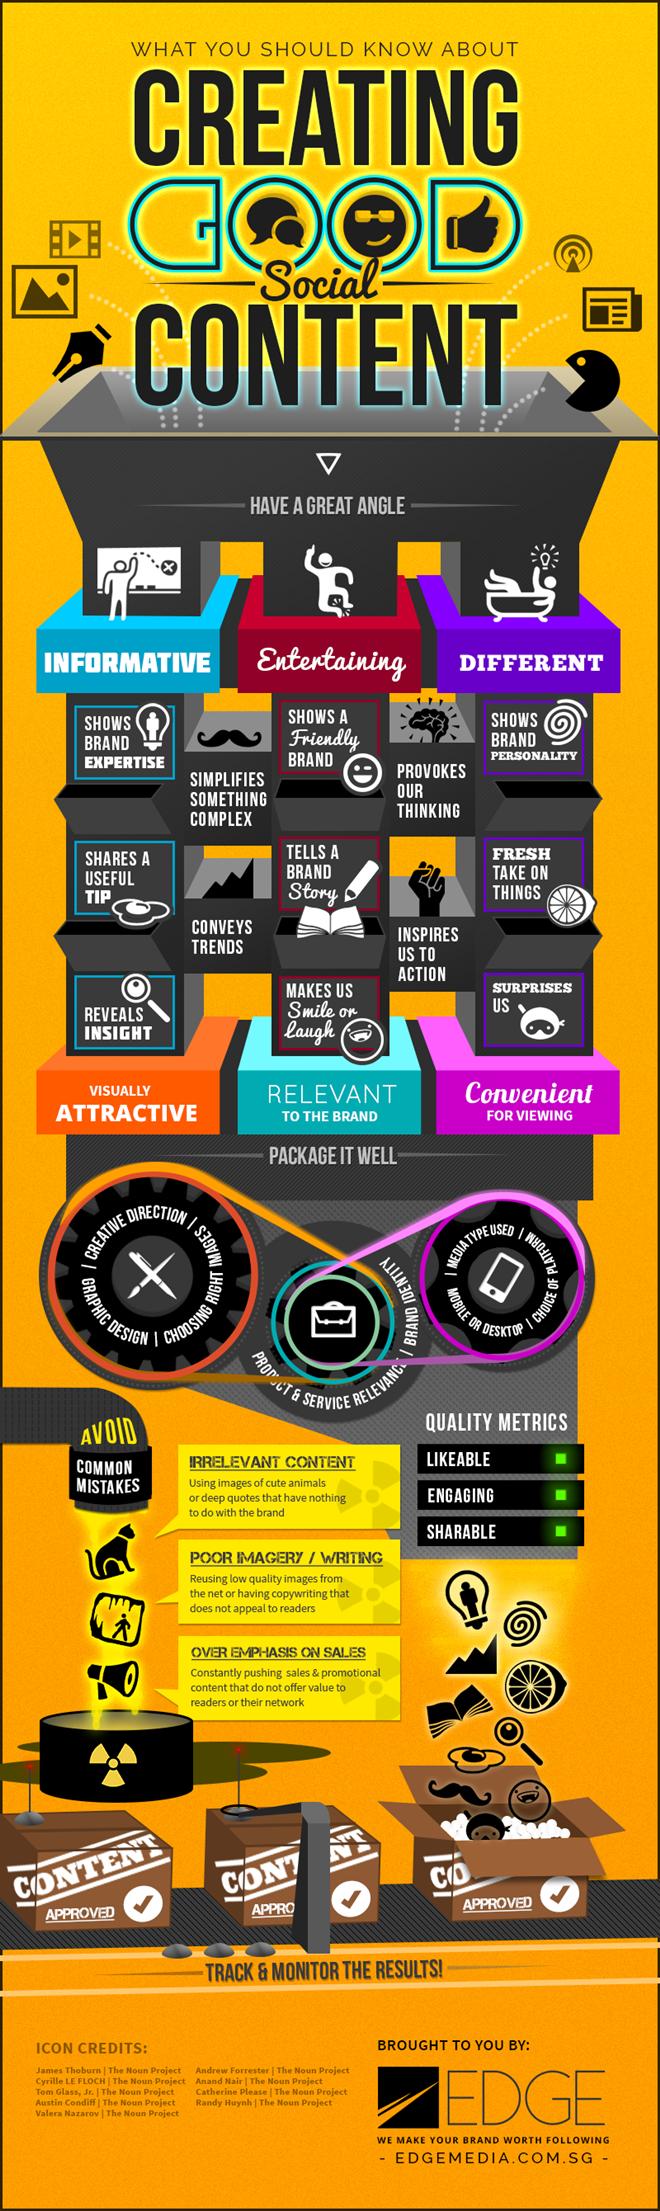 Creando un gran contenido social